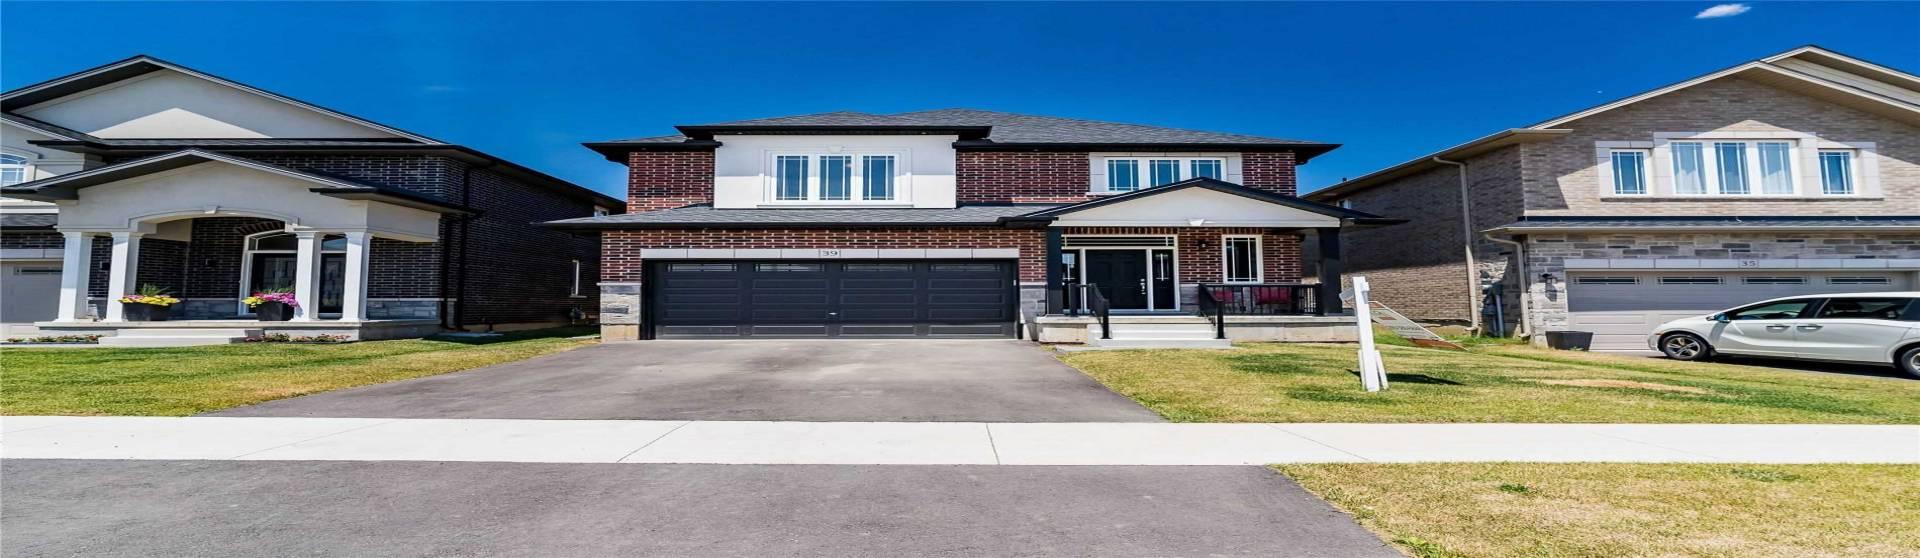 39 Robertson Rd, Hamilton, Ontario L9G 3K9, 4 Bedrooms Bedrooms, 3 Rooms Rooms,3 BathroomsBathrooms,Detached,Sale,Robertson,X4813189